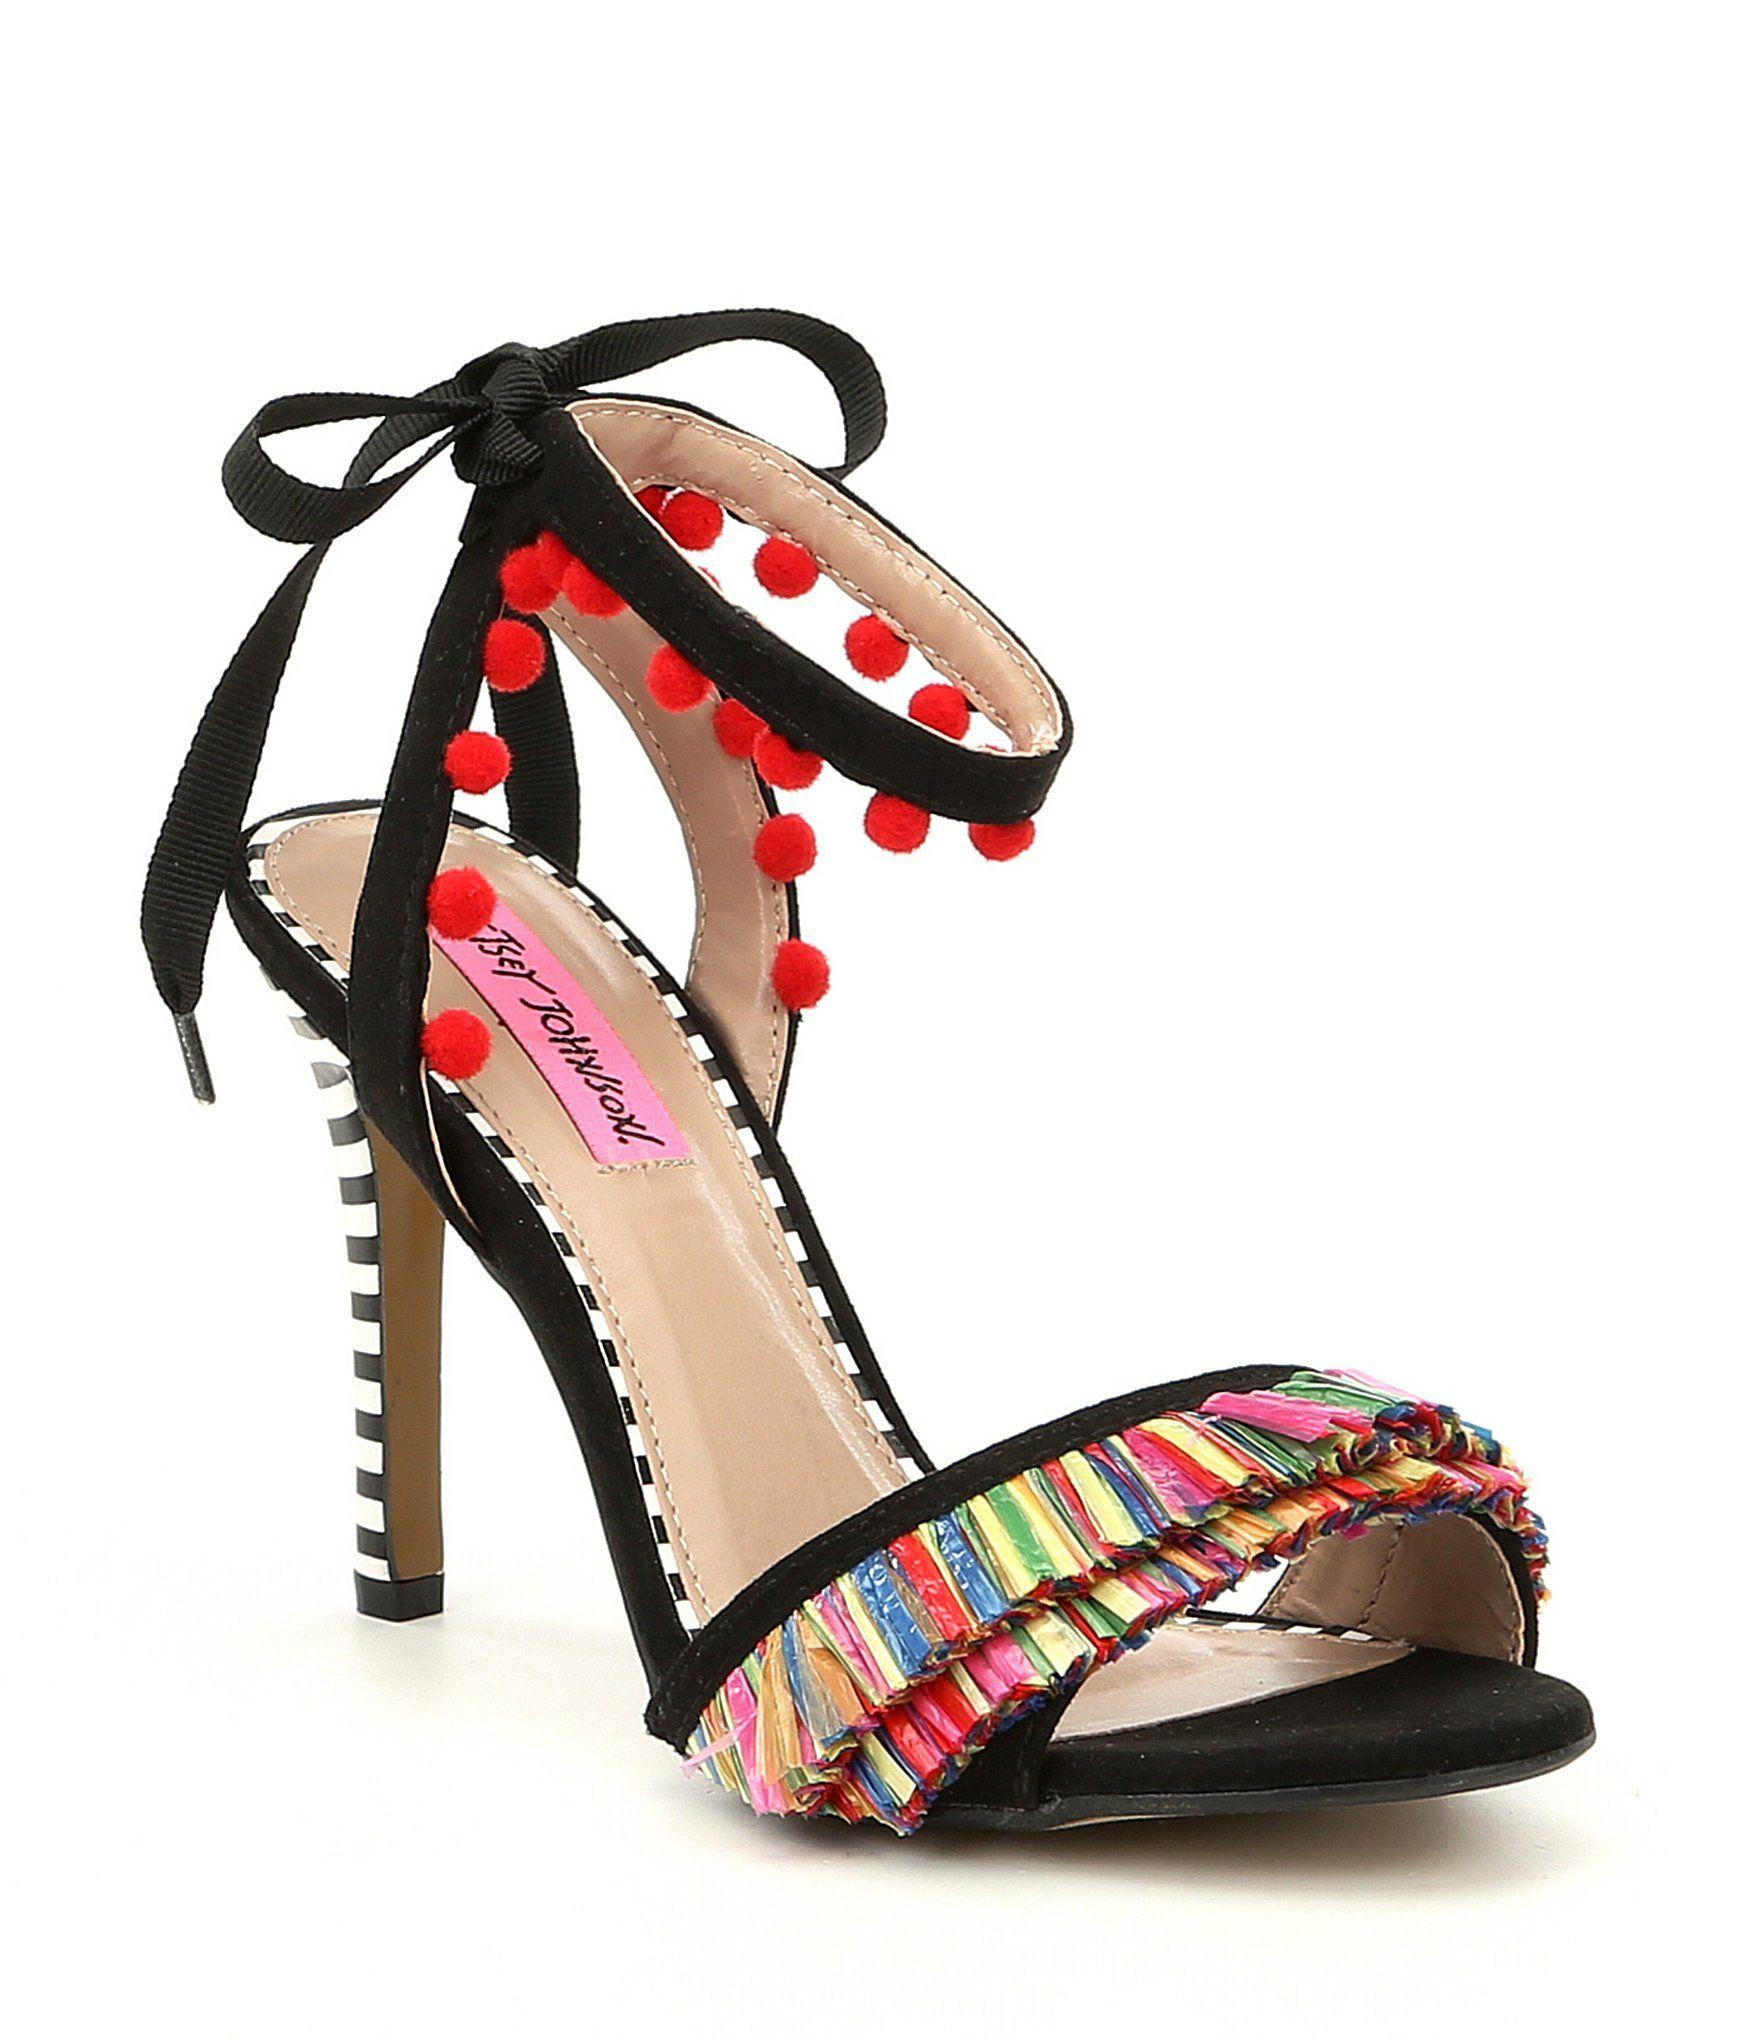 6f4f40ada52 Shop for Betsey Johnson Rina Tassel and Raffia Fringe Tie Sandals at ...